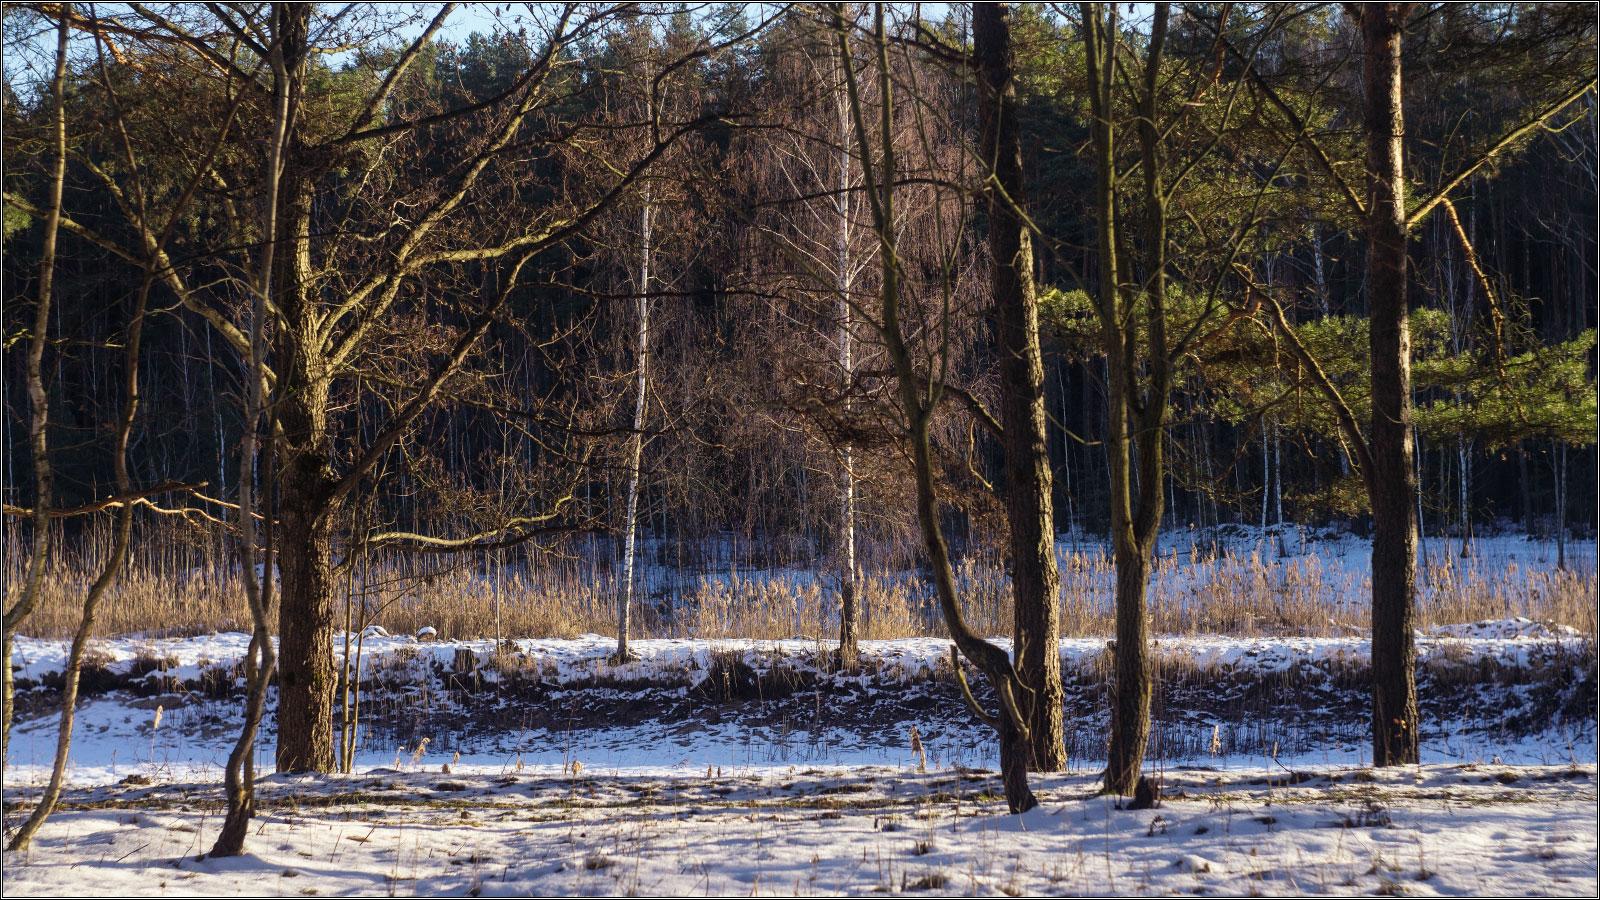 http://i2.imageban.ru/out/2013/12/15/0eed2e656def7d9ab71e32fbeb6ff938.jpg